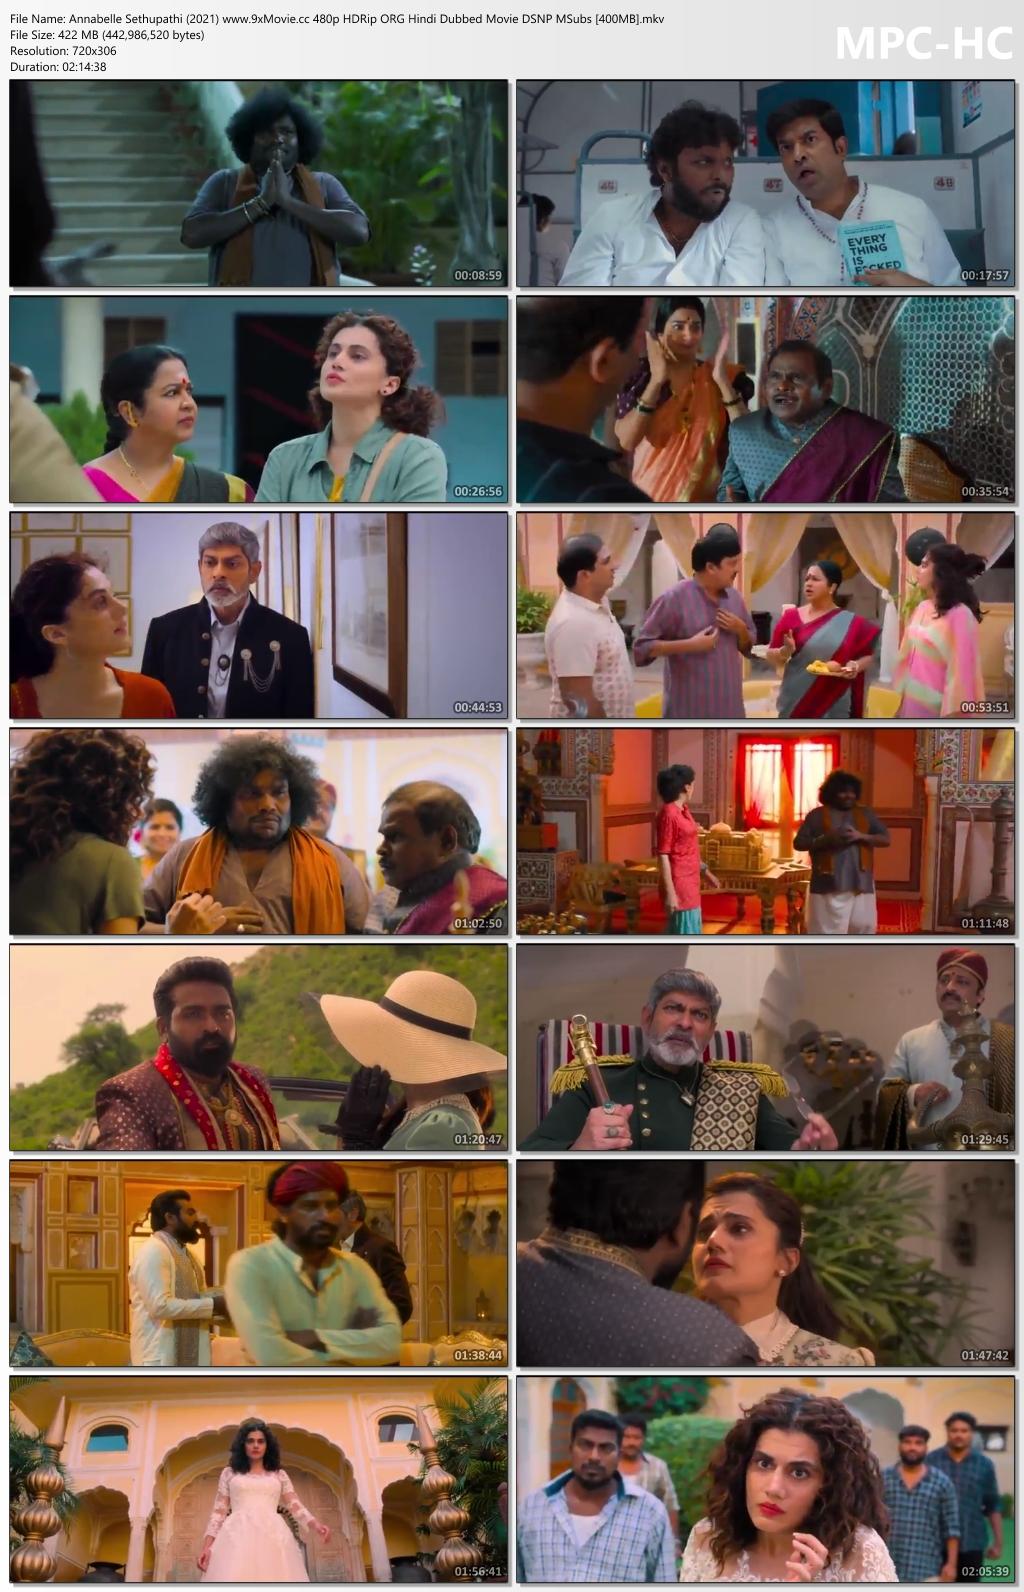 Annabelle-Sethupathi-2021-www-9x-Movie-cc-480p-HDRip-ORG-Hindi-Dubbed-Movie-DSNP-MSubs-400-MB-mkv